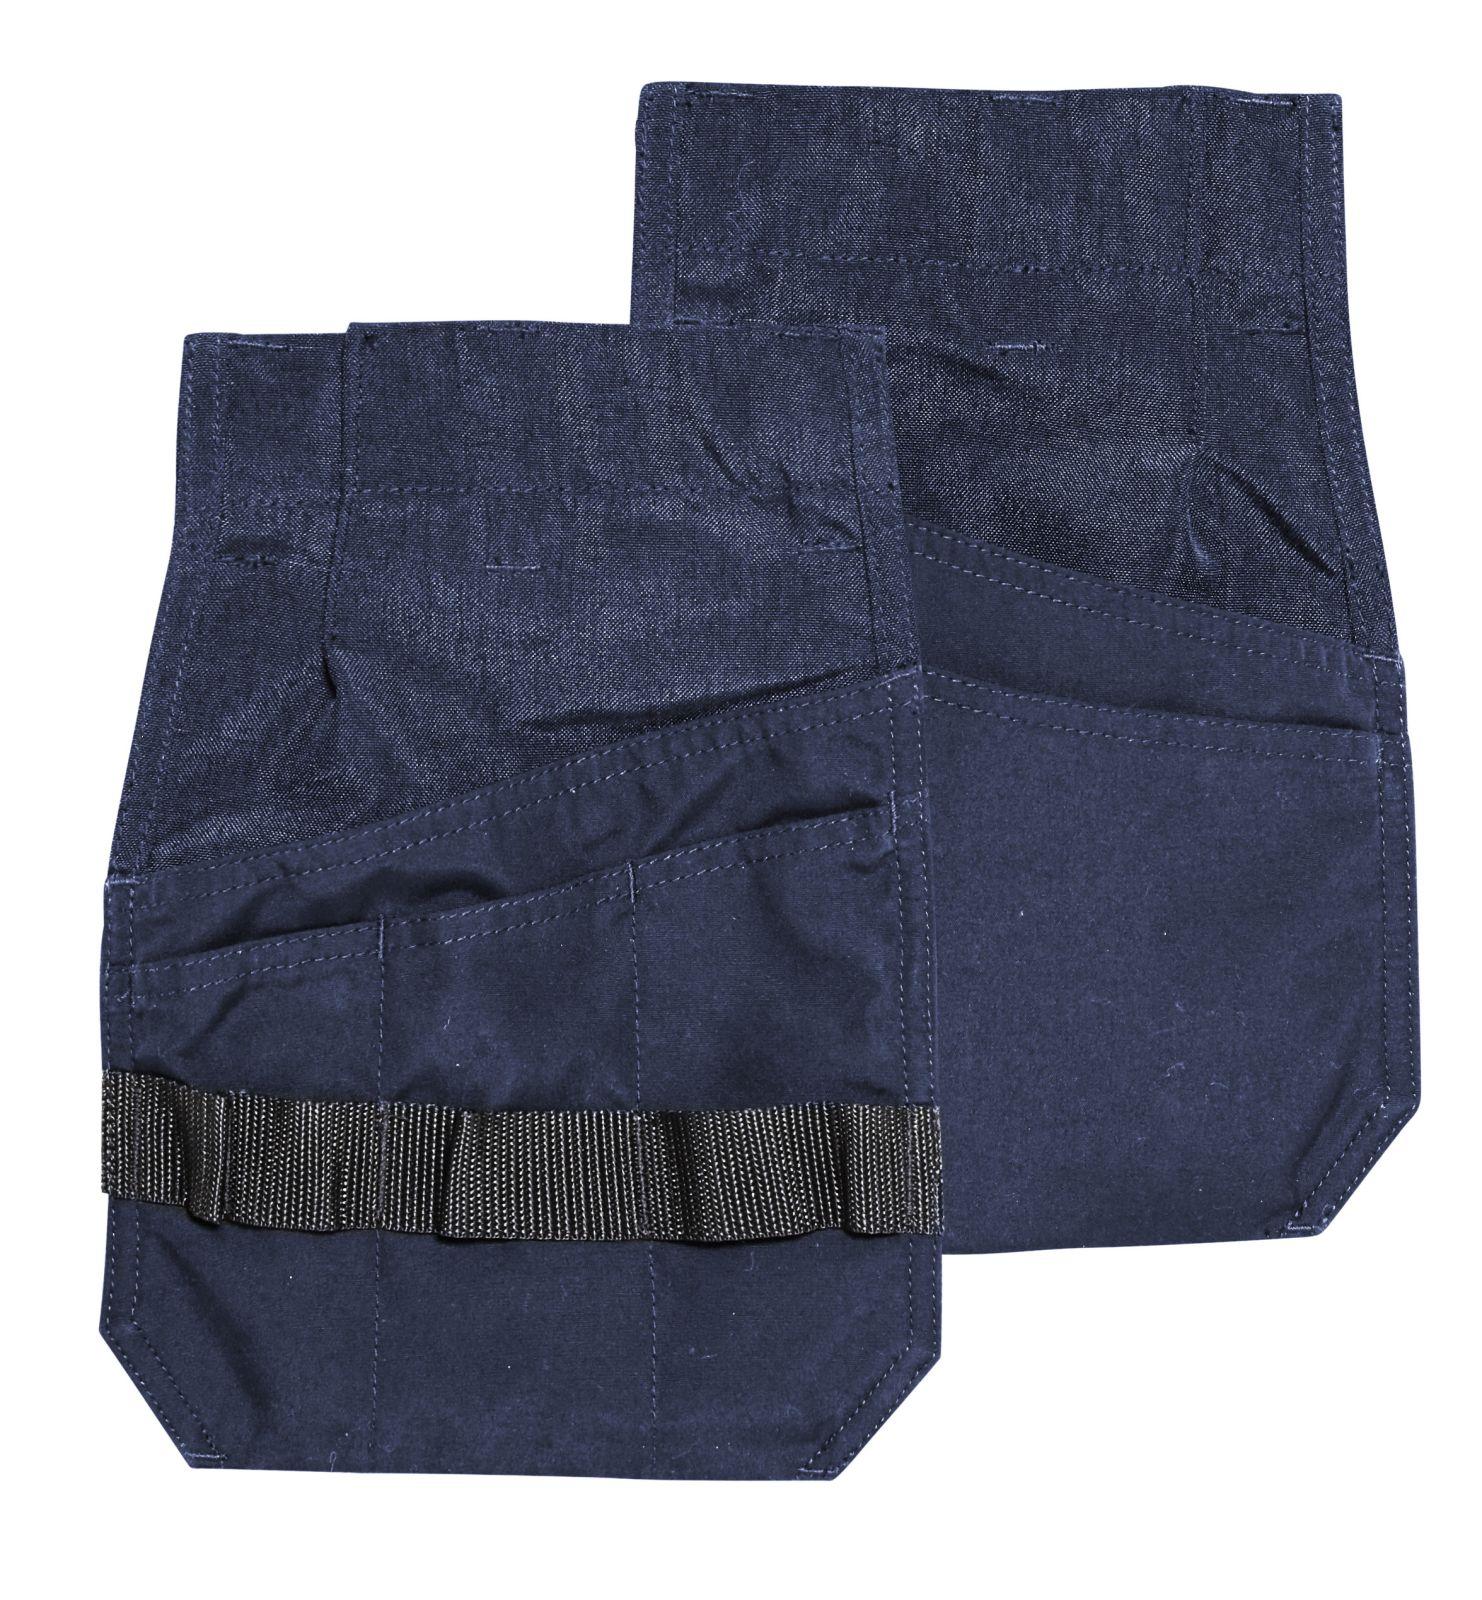 Blaklader Losse spijkerzakken 21591860 marineblauw(8900)